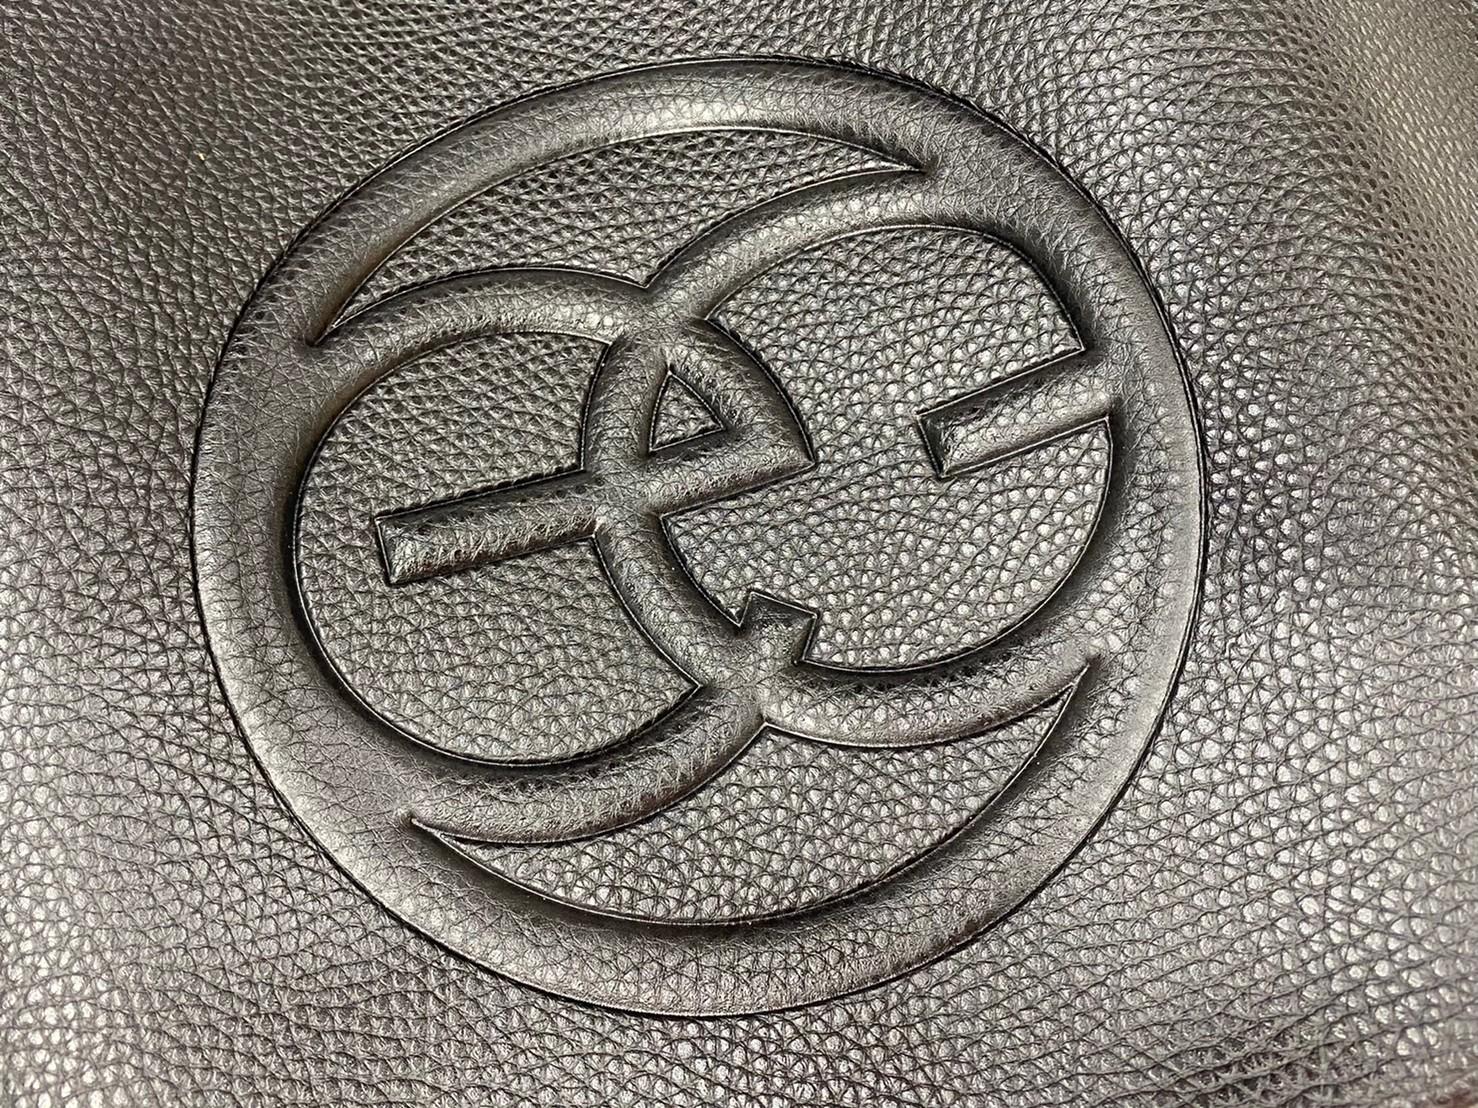 『egロゴトートバッグ』のロゴ画像